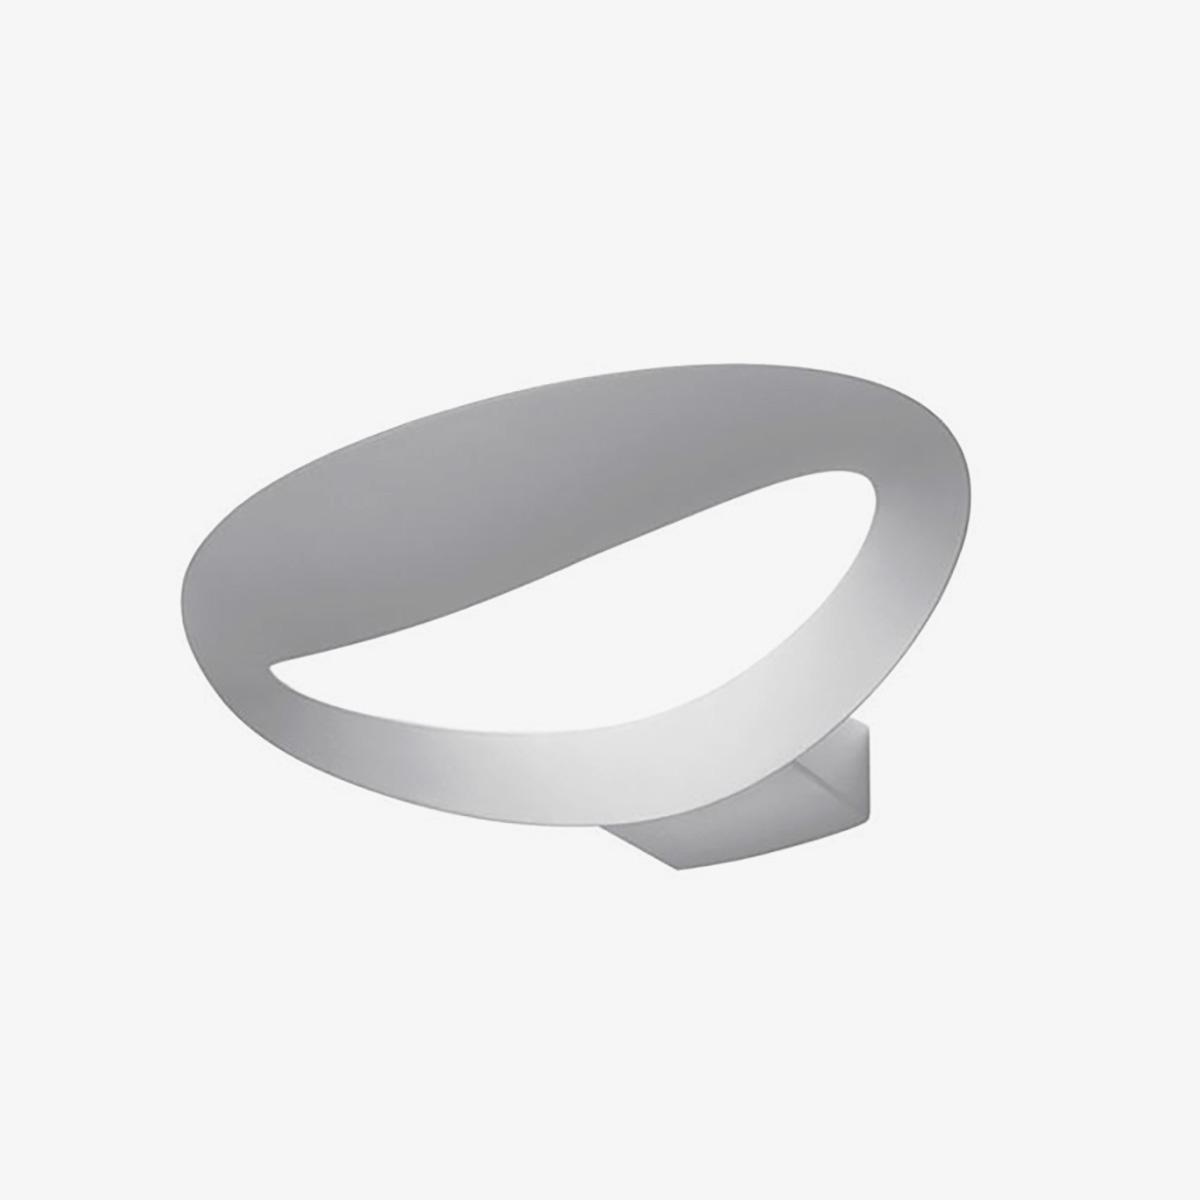 Aplique pared Mesmeri Parete blanco LED Artemide-0